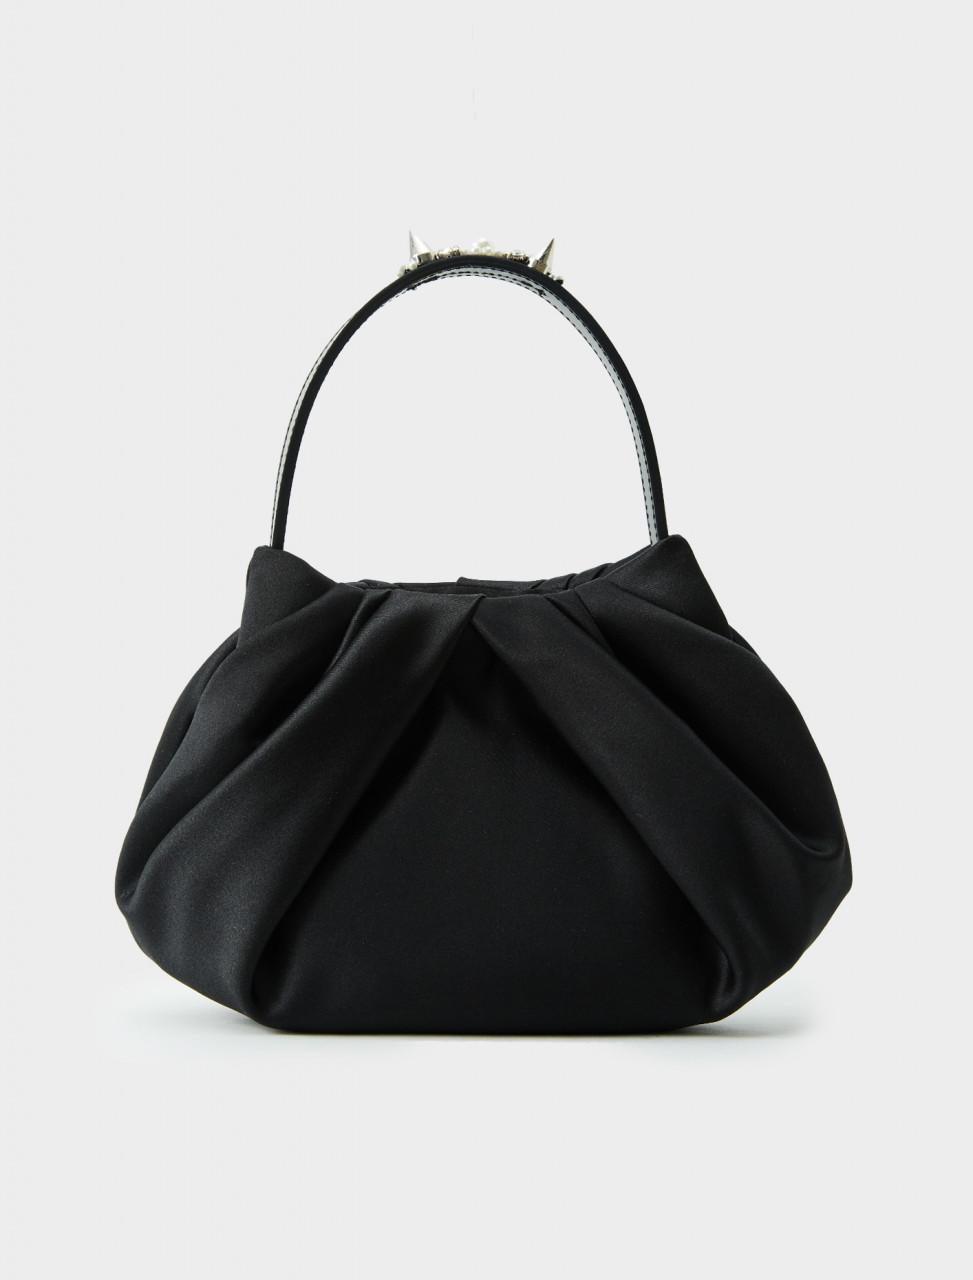 Simone Rocha Satin Mini Pleated Bag in Black